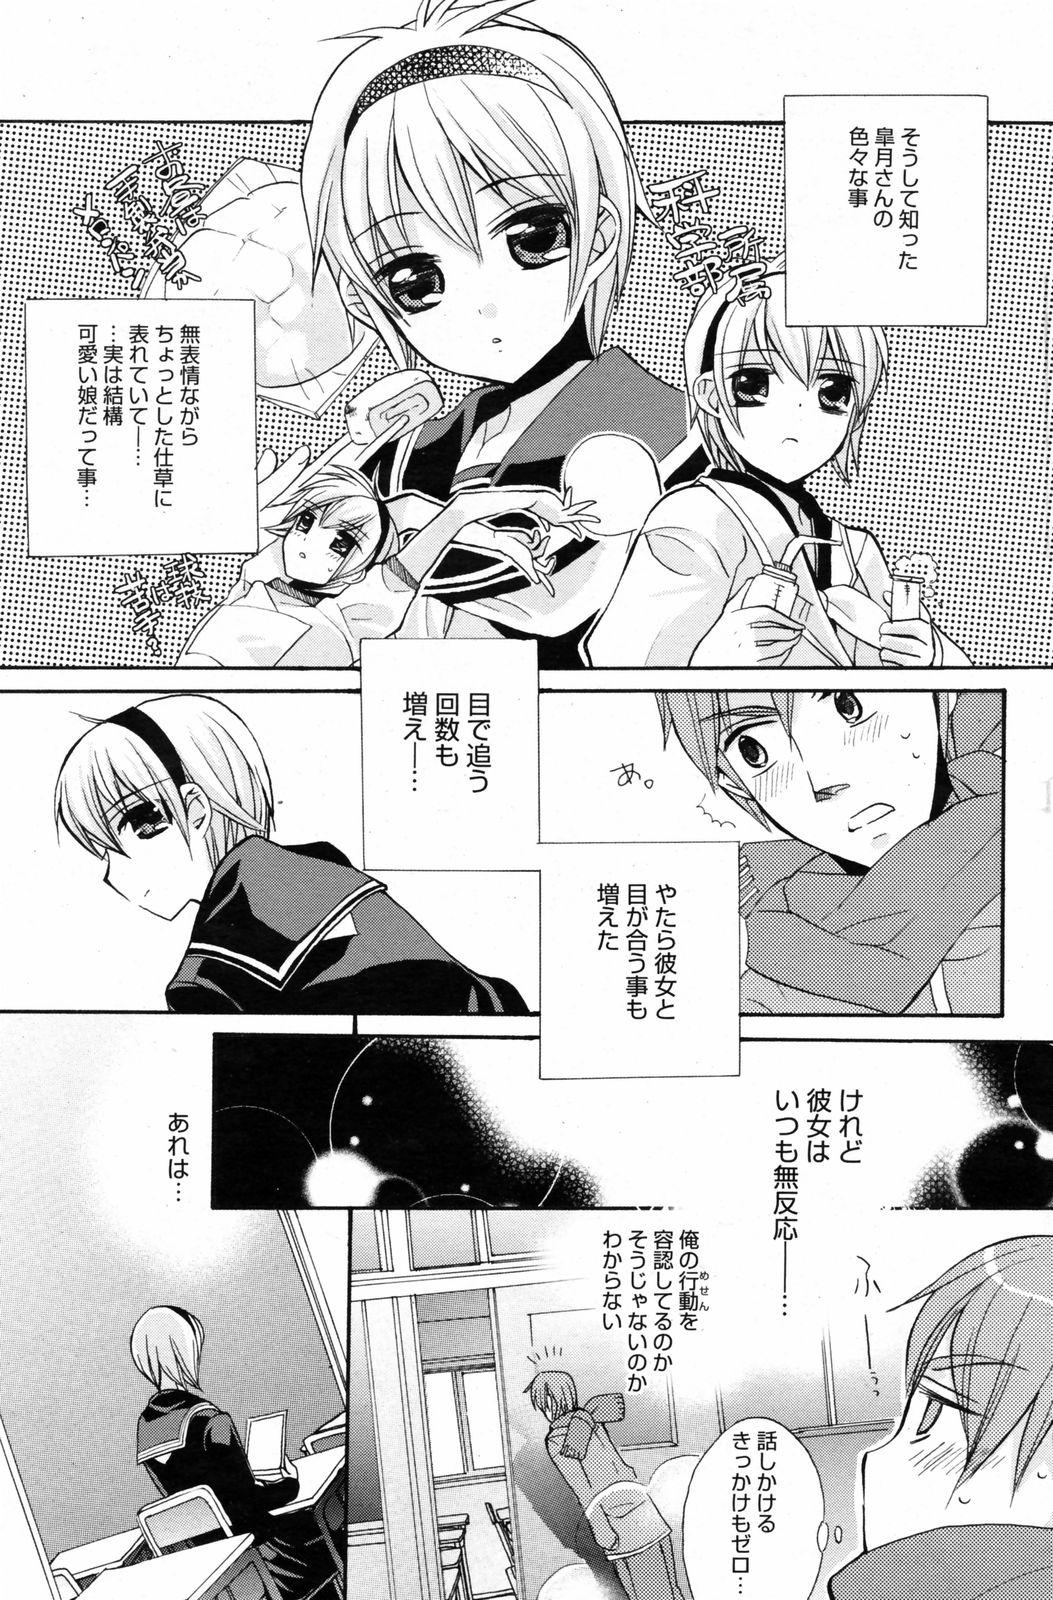 Manga Bangaichi 2008-03 104